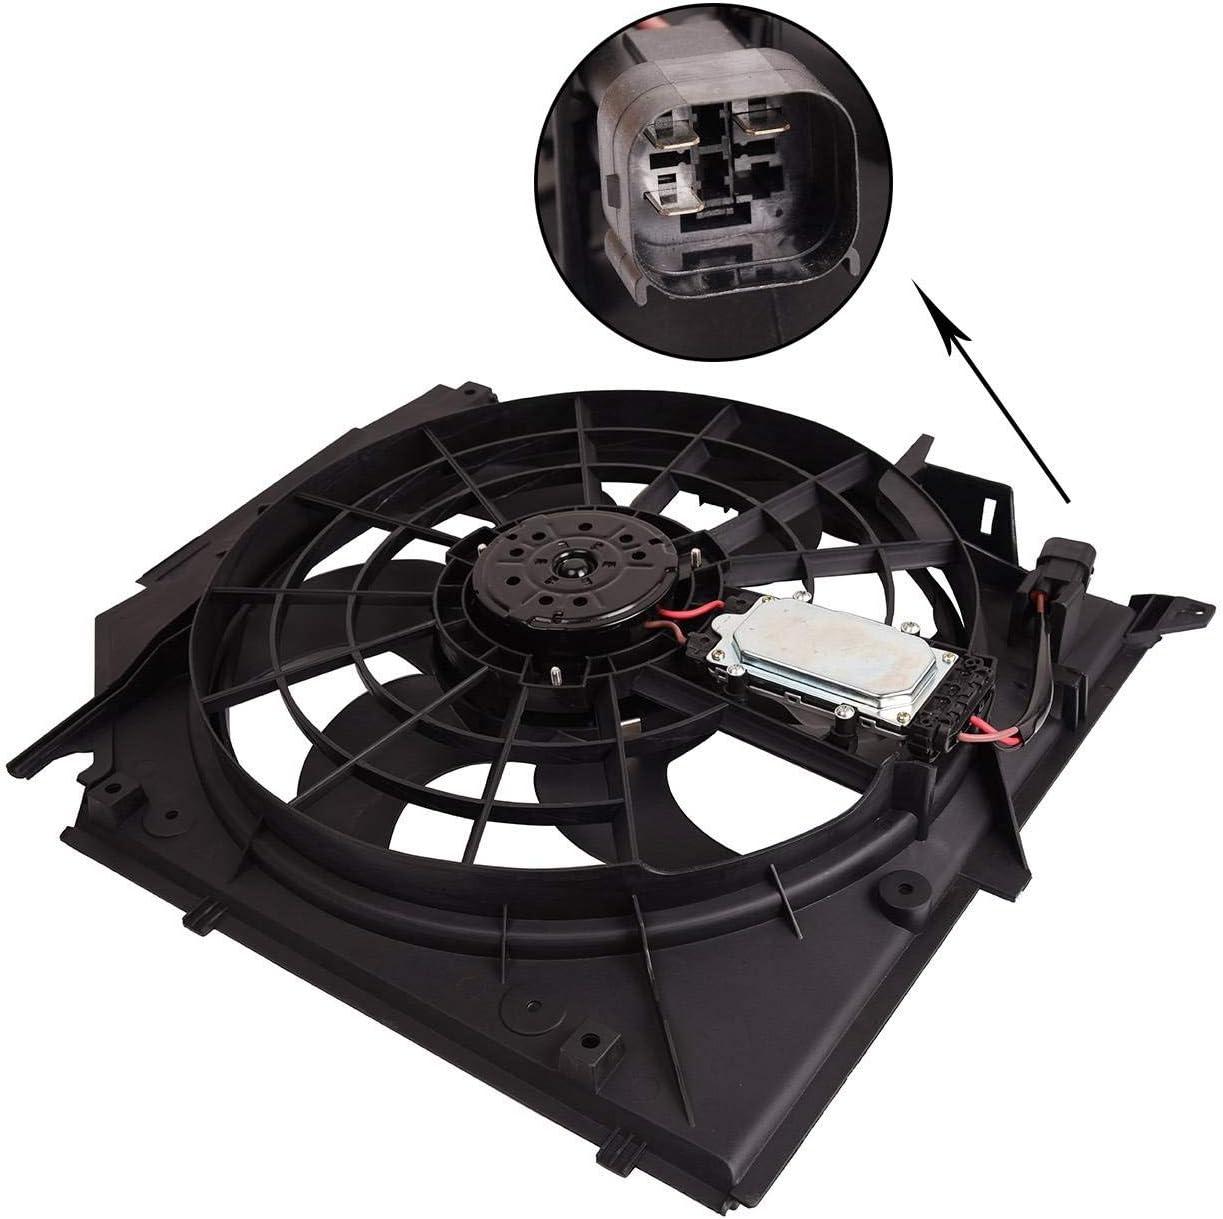 Bapmic 17117561757 Radiator Cooling Fan Assembly for BMW E46 325i 328i 330i 99-05